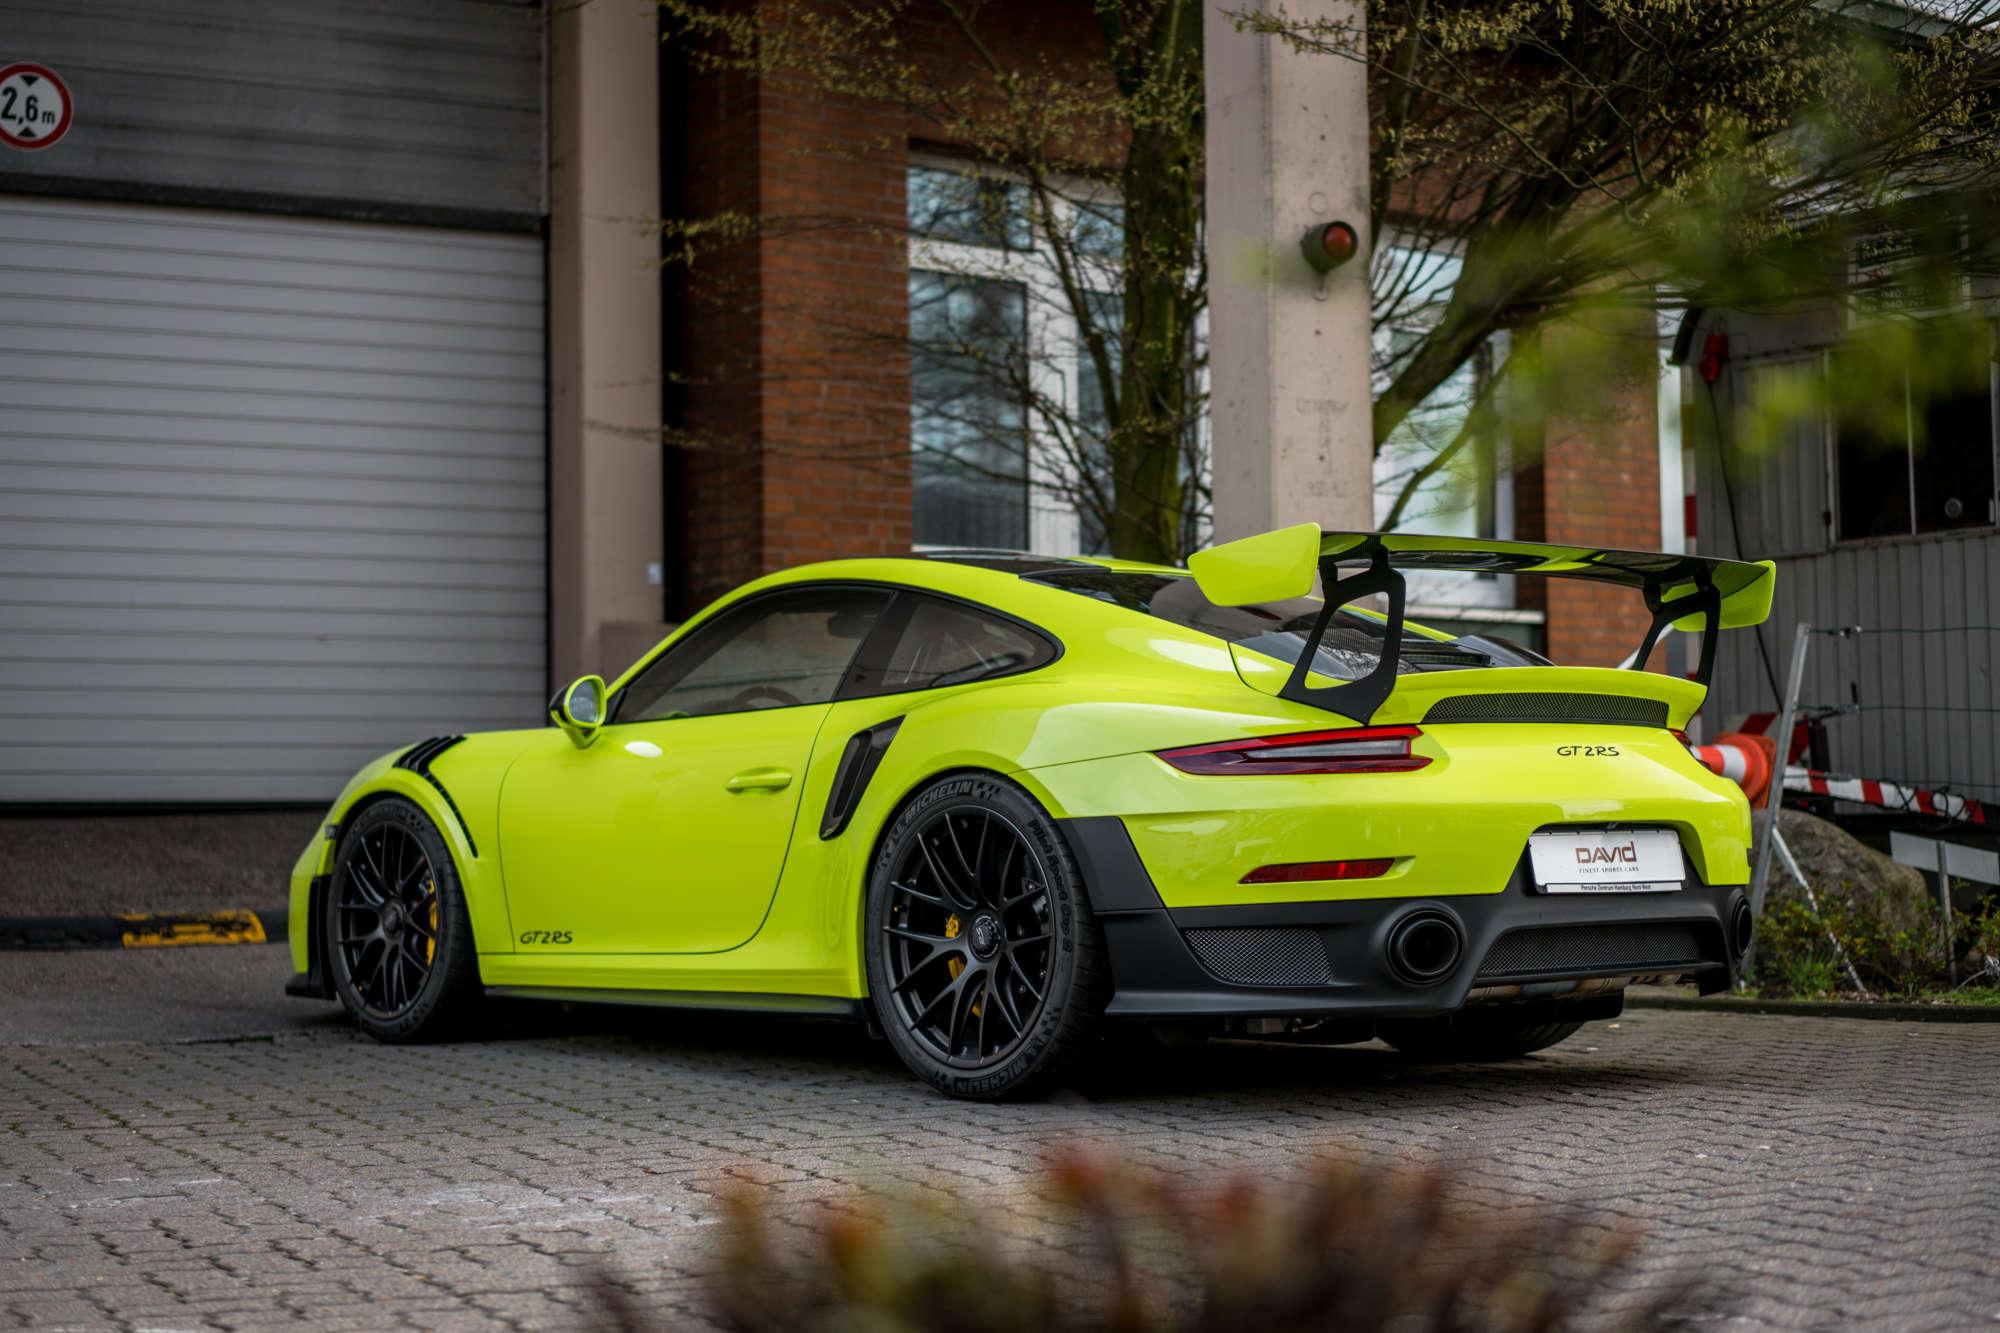 Porsche 991 Gt2 Rs 2018 Elferspot Com Marketplace For Porsche Sports Cars